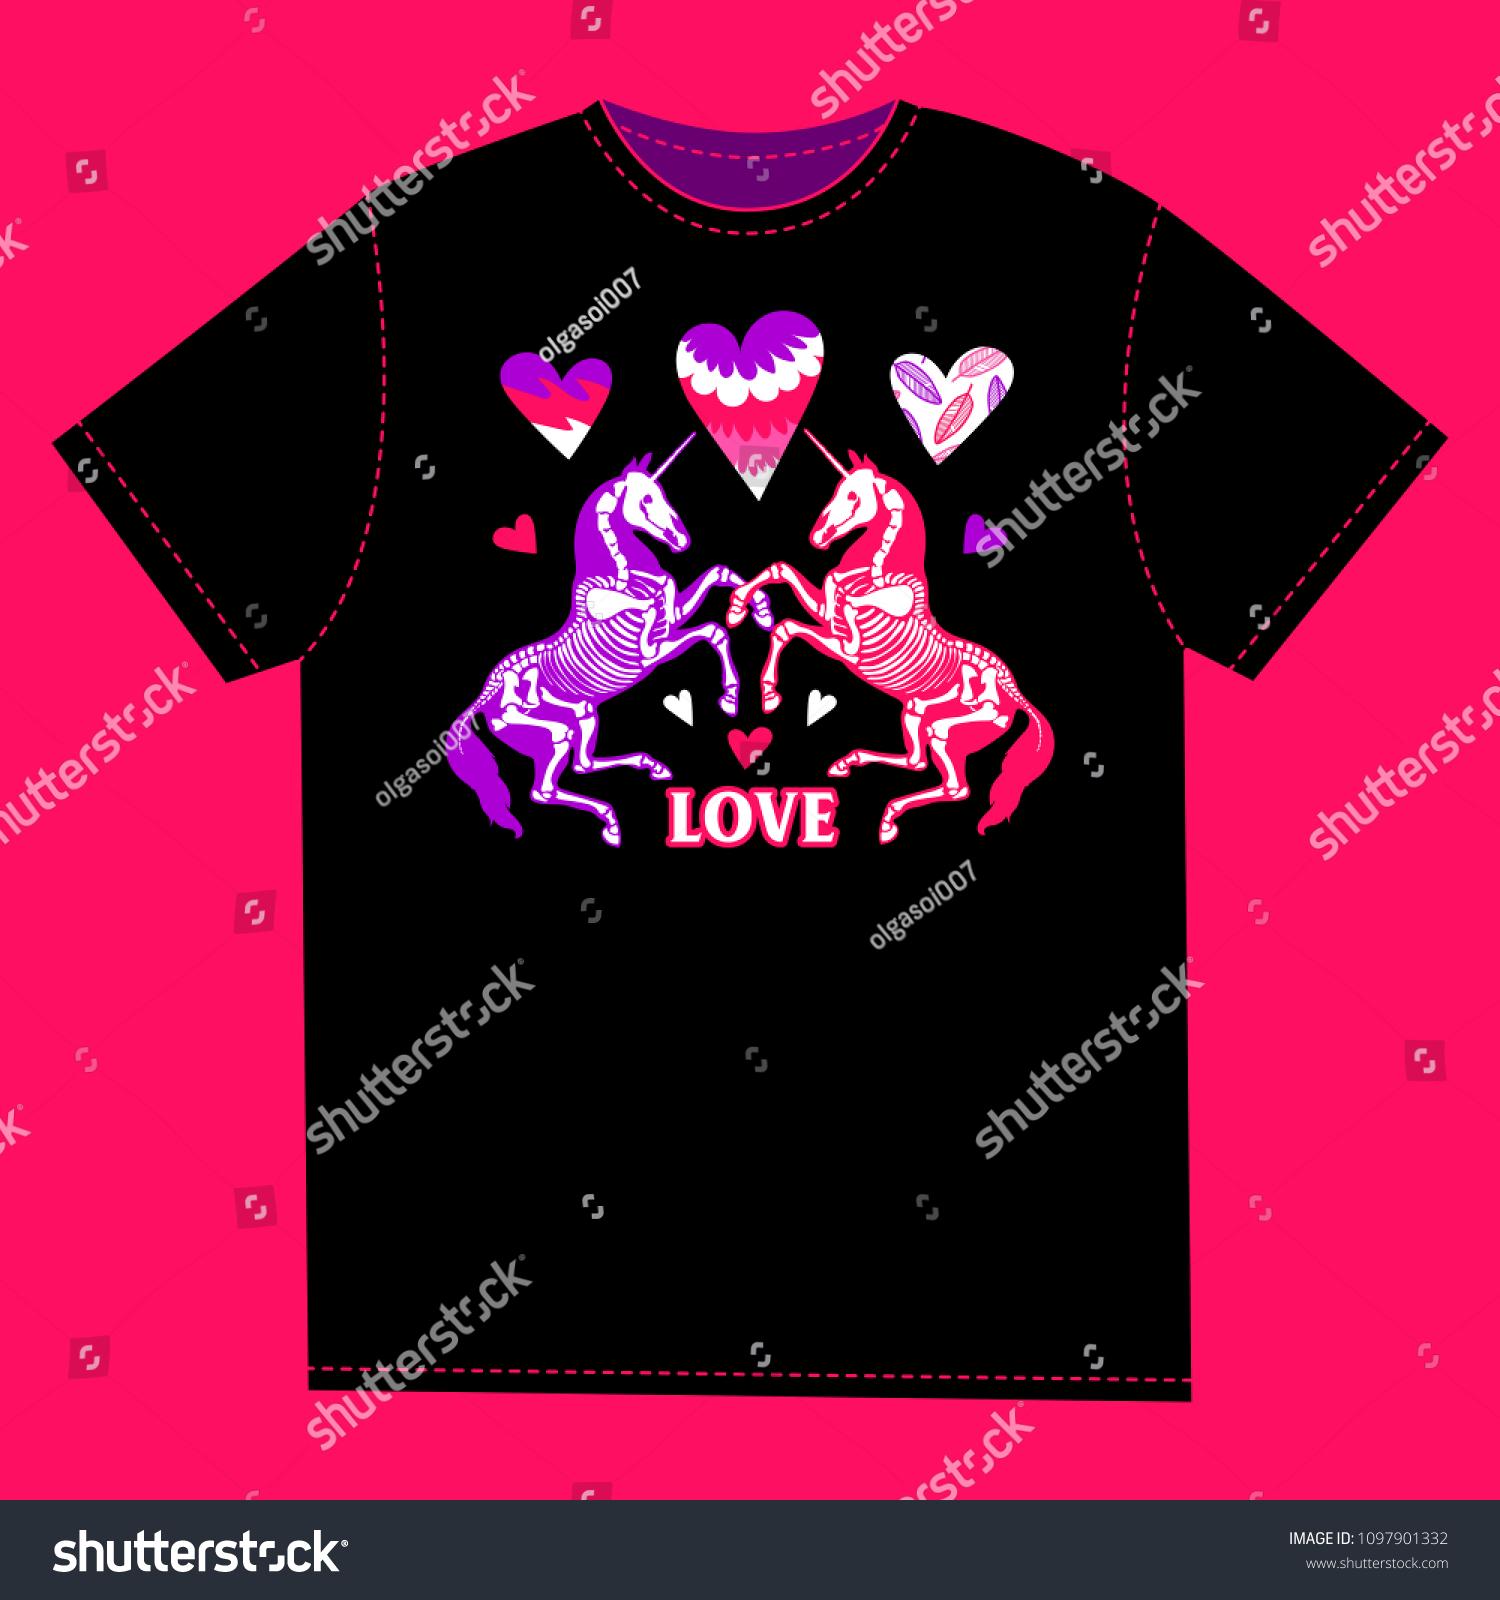 Tshirt Print Enamored Unicorns Among Hearts Stock Vector 1097901332